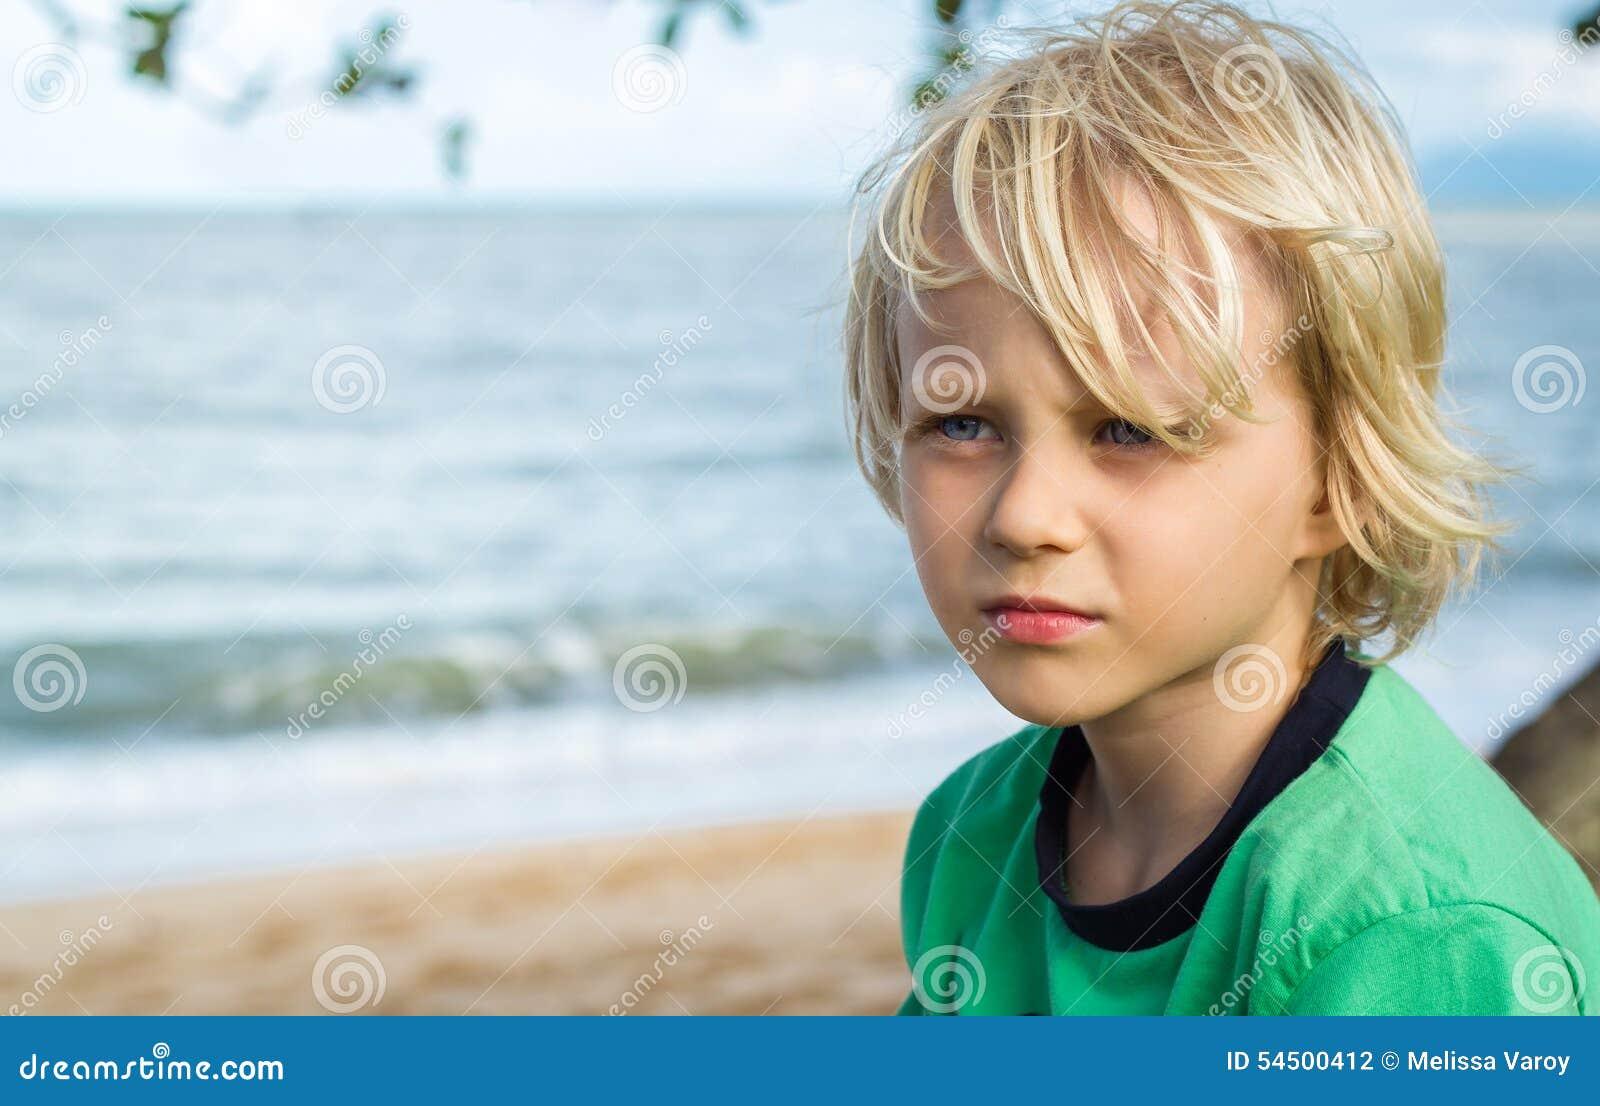 Porträt eines jungen besorgten Jungen